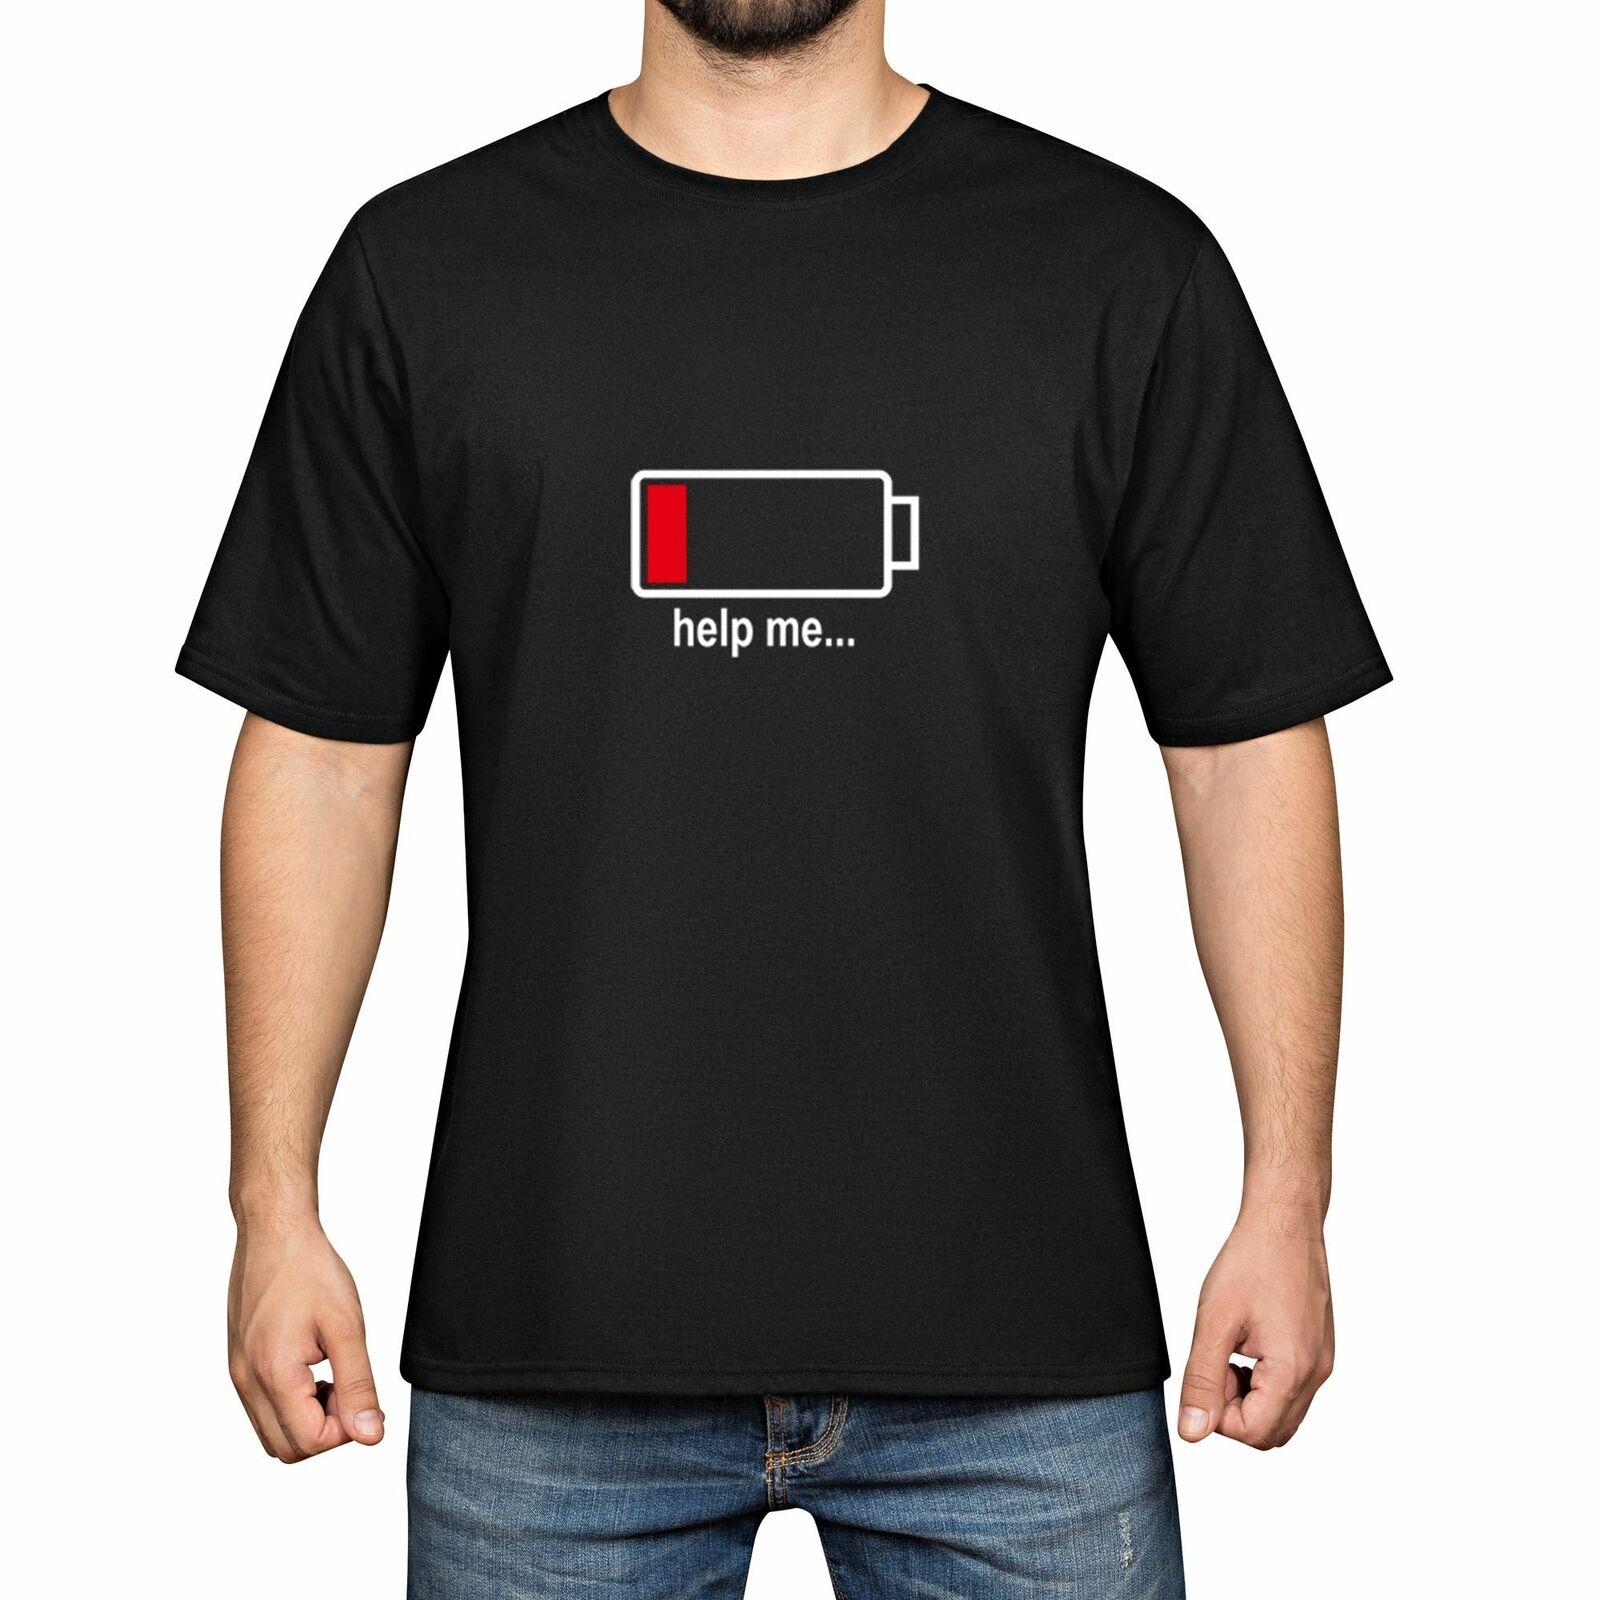 Camisetas de moda divertidas de algodón Help Me Men Camiseta de manga corta